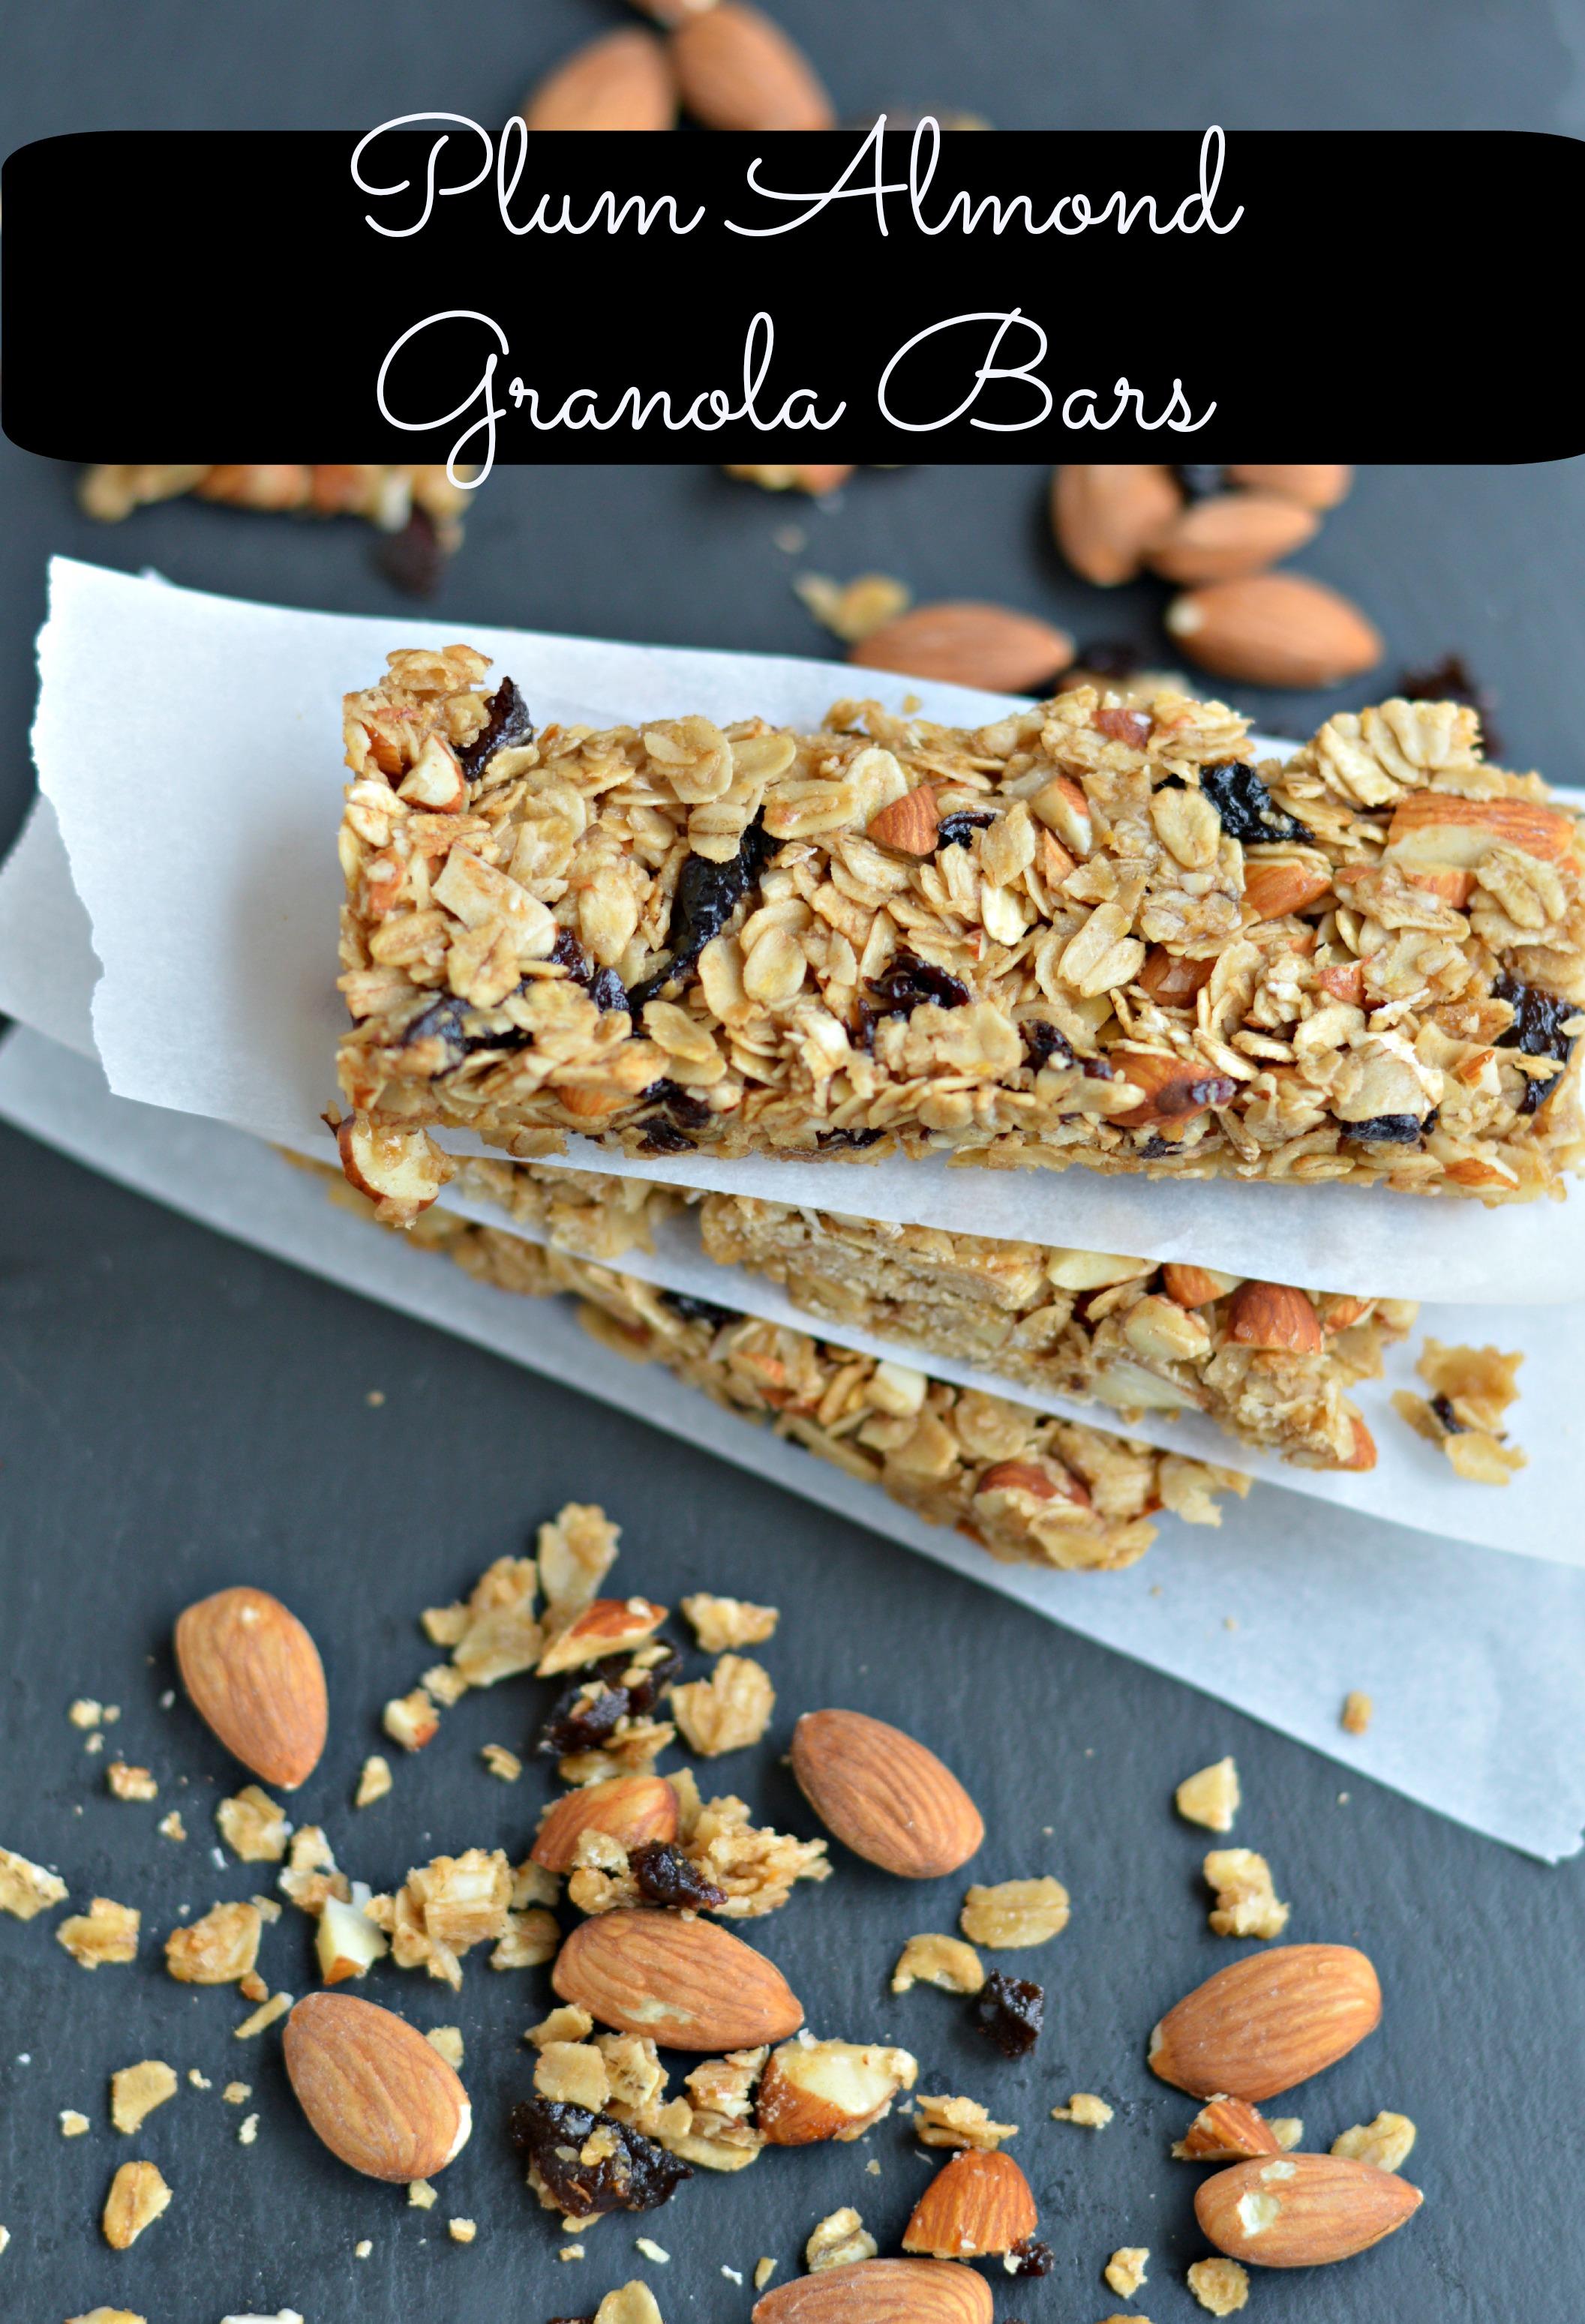 Healthy Eating: Homemade Granola Bars